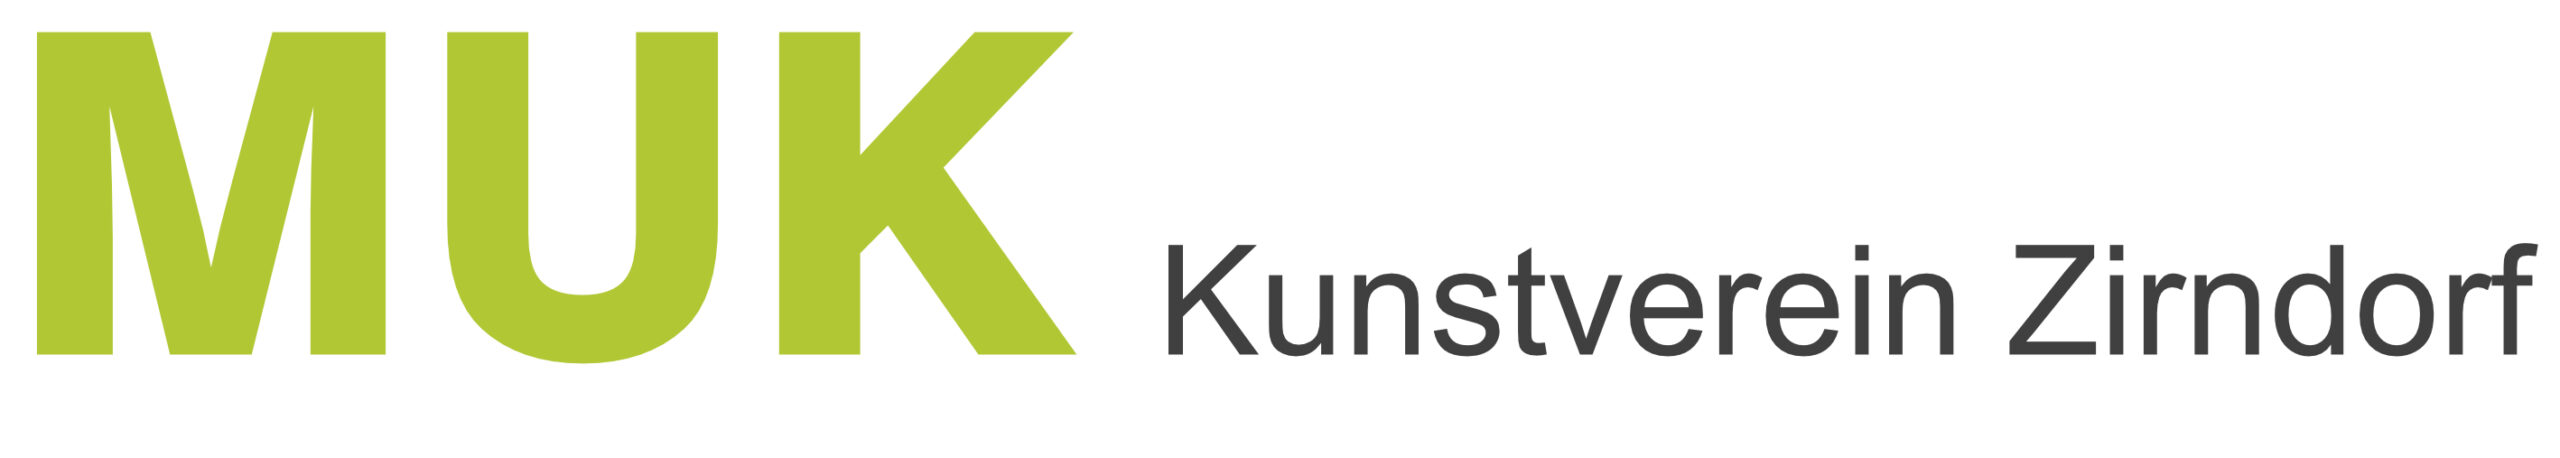 MUK Kunstverein Zirndorf